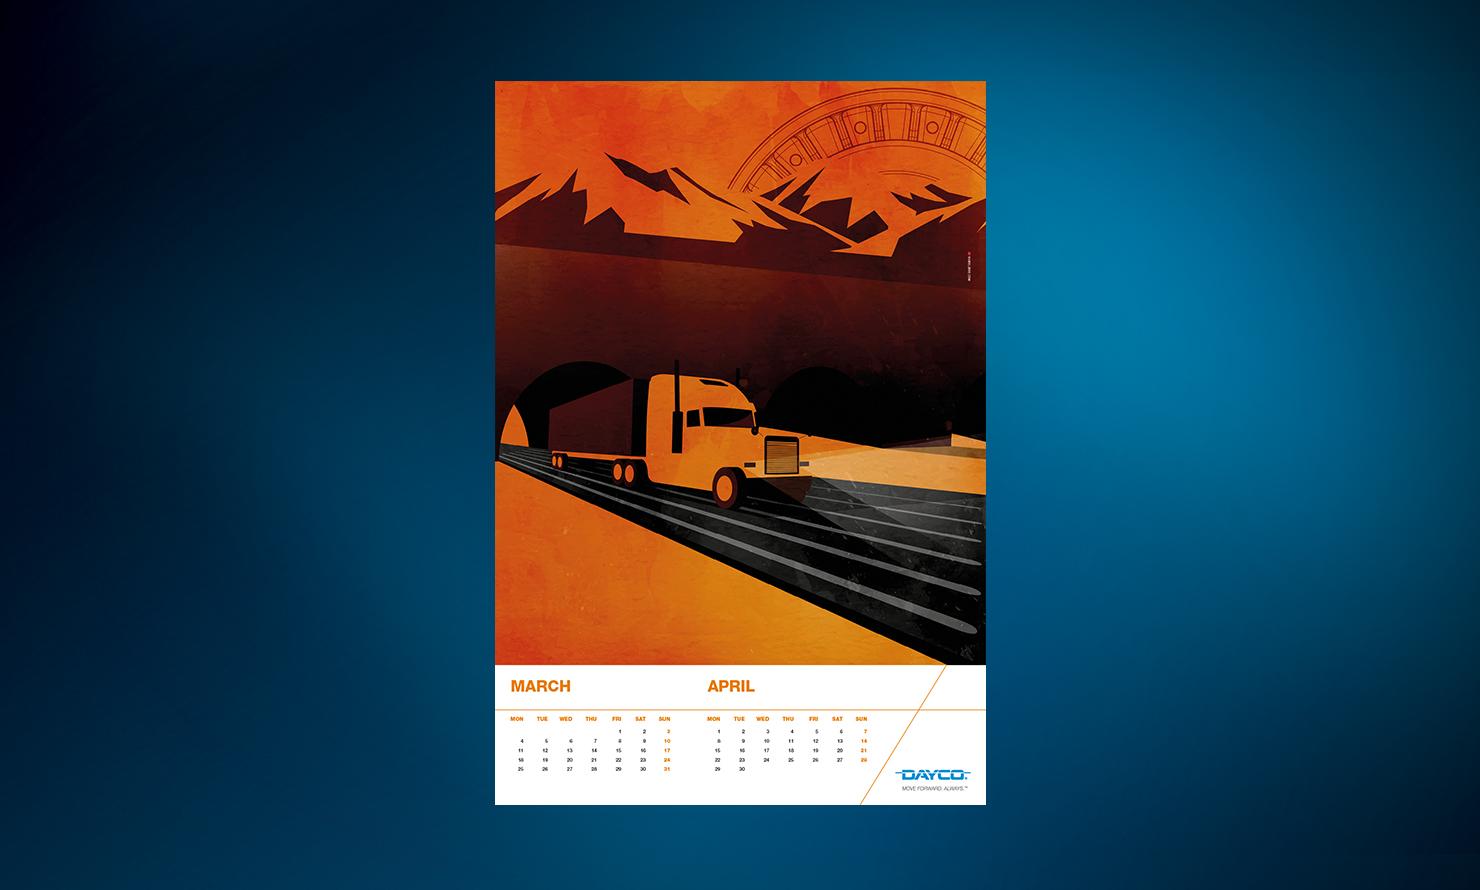 https://www.kubelibre.com/uploads/Slider-work-tutti-clienti/dayco-calendario-2019-2.jpg